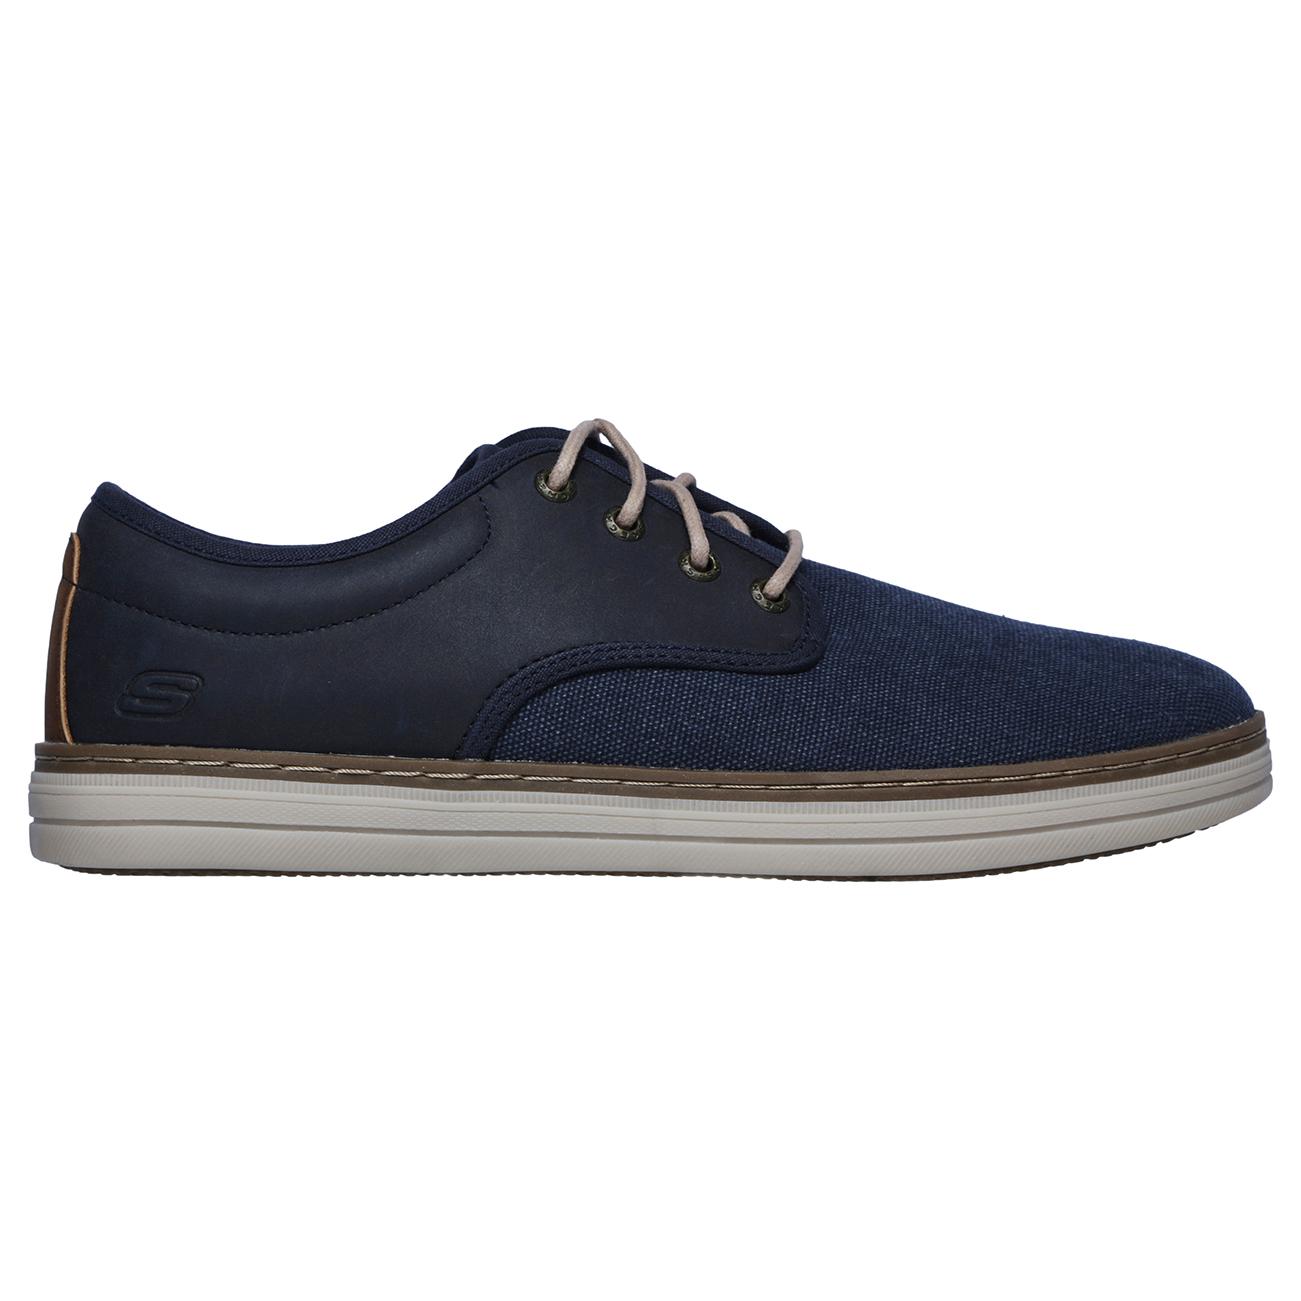 sketcher mens shoes